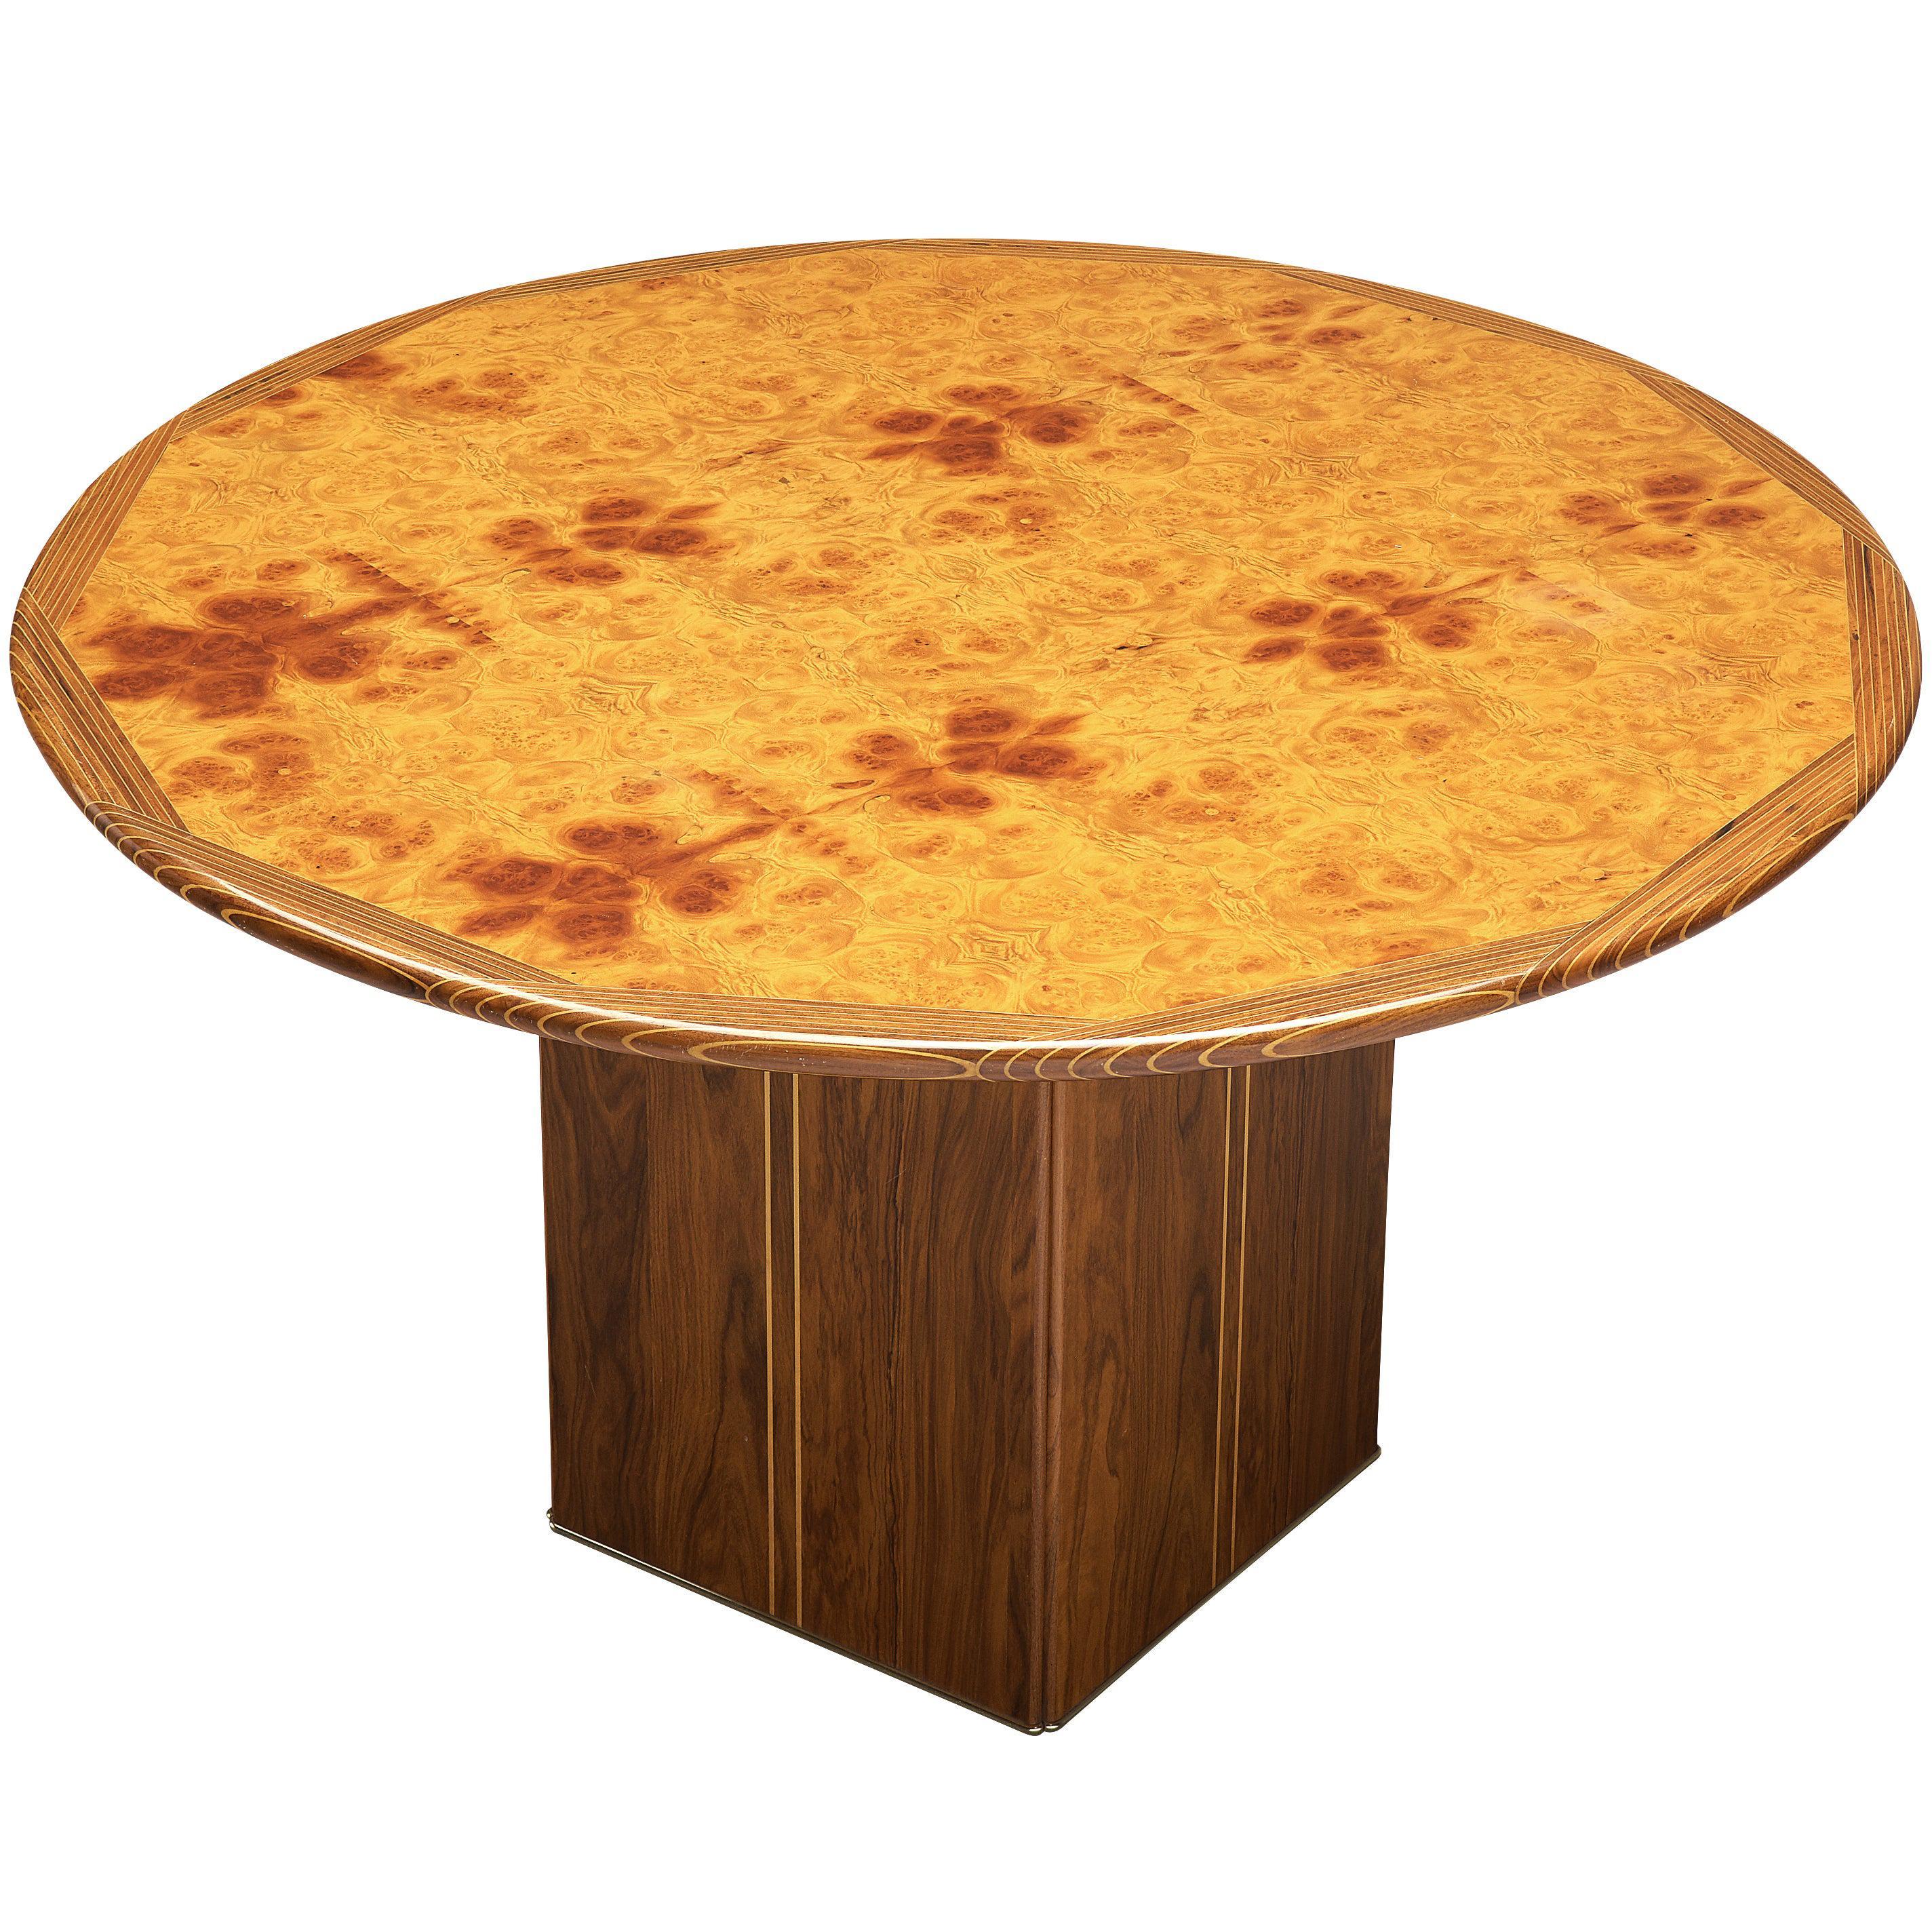 Afra & Tobia Scarpa Round Dining Table 'Artona' in Walnut